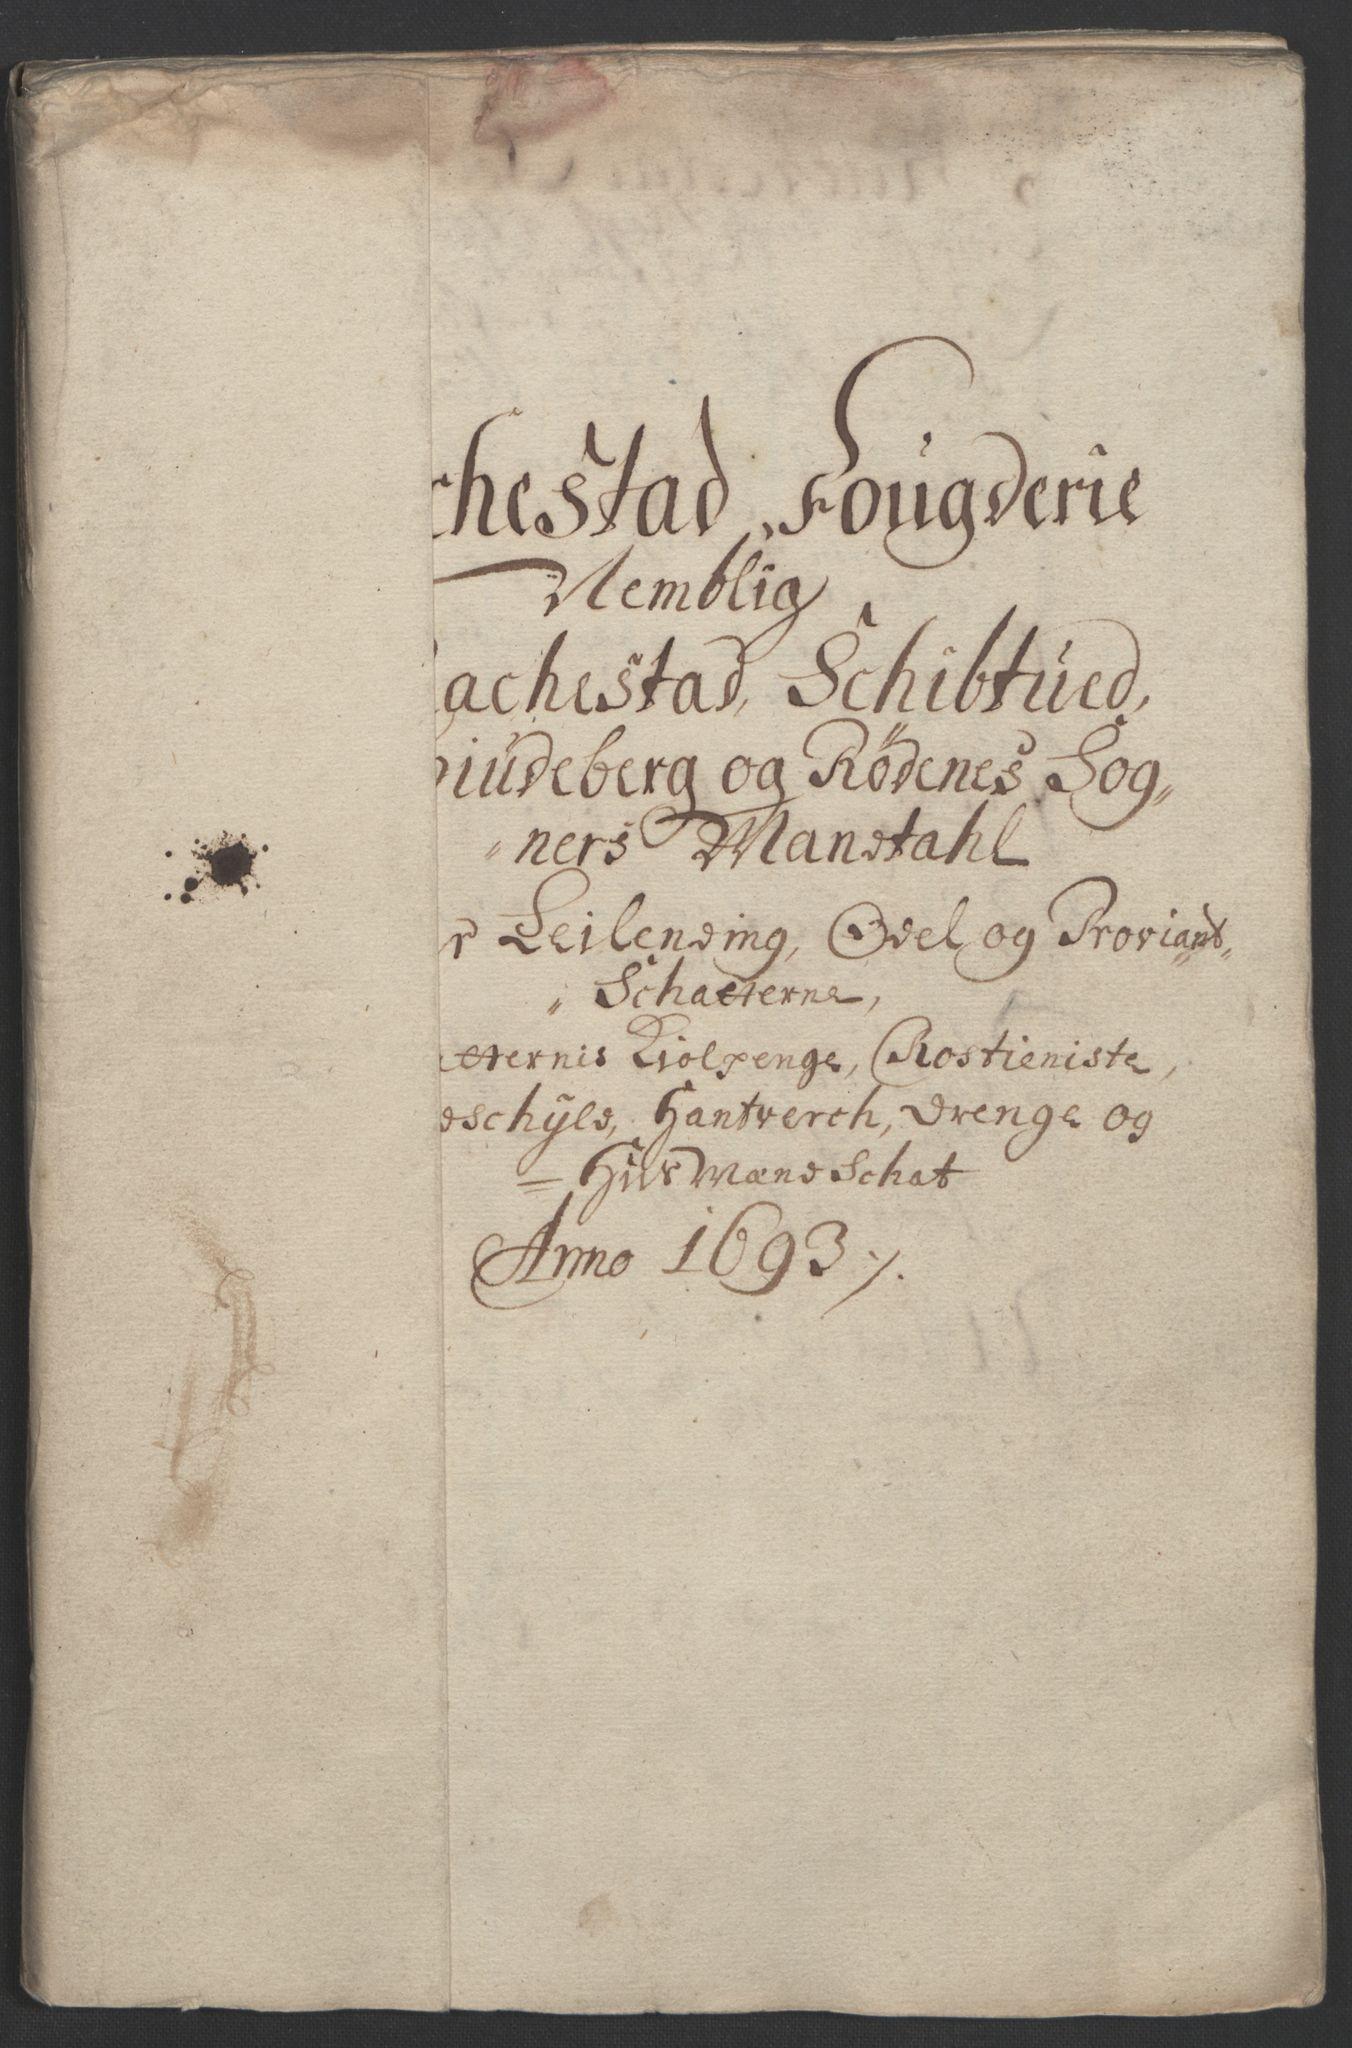 RA, Rentekammeret inntil 1814, Reviderte regnskaper, Fogderegnskap, R05/L0278: Fogderegnskap Rakkestad, 1691-1693, s. 397